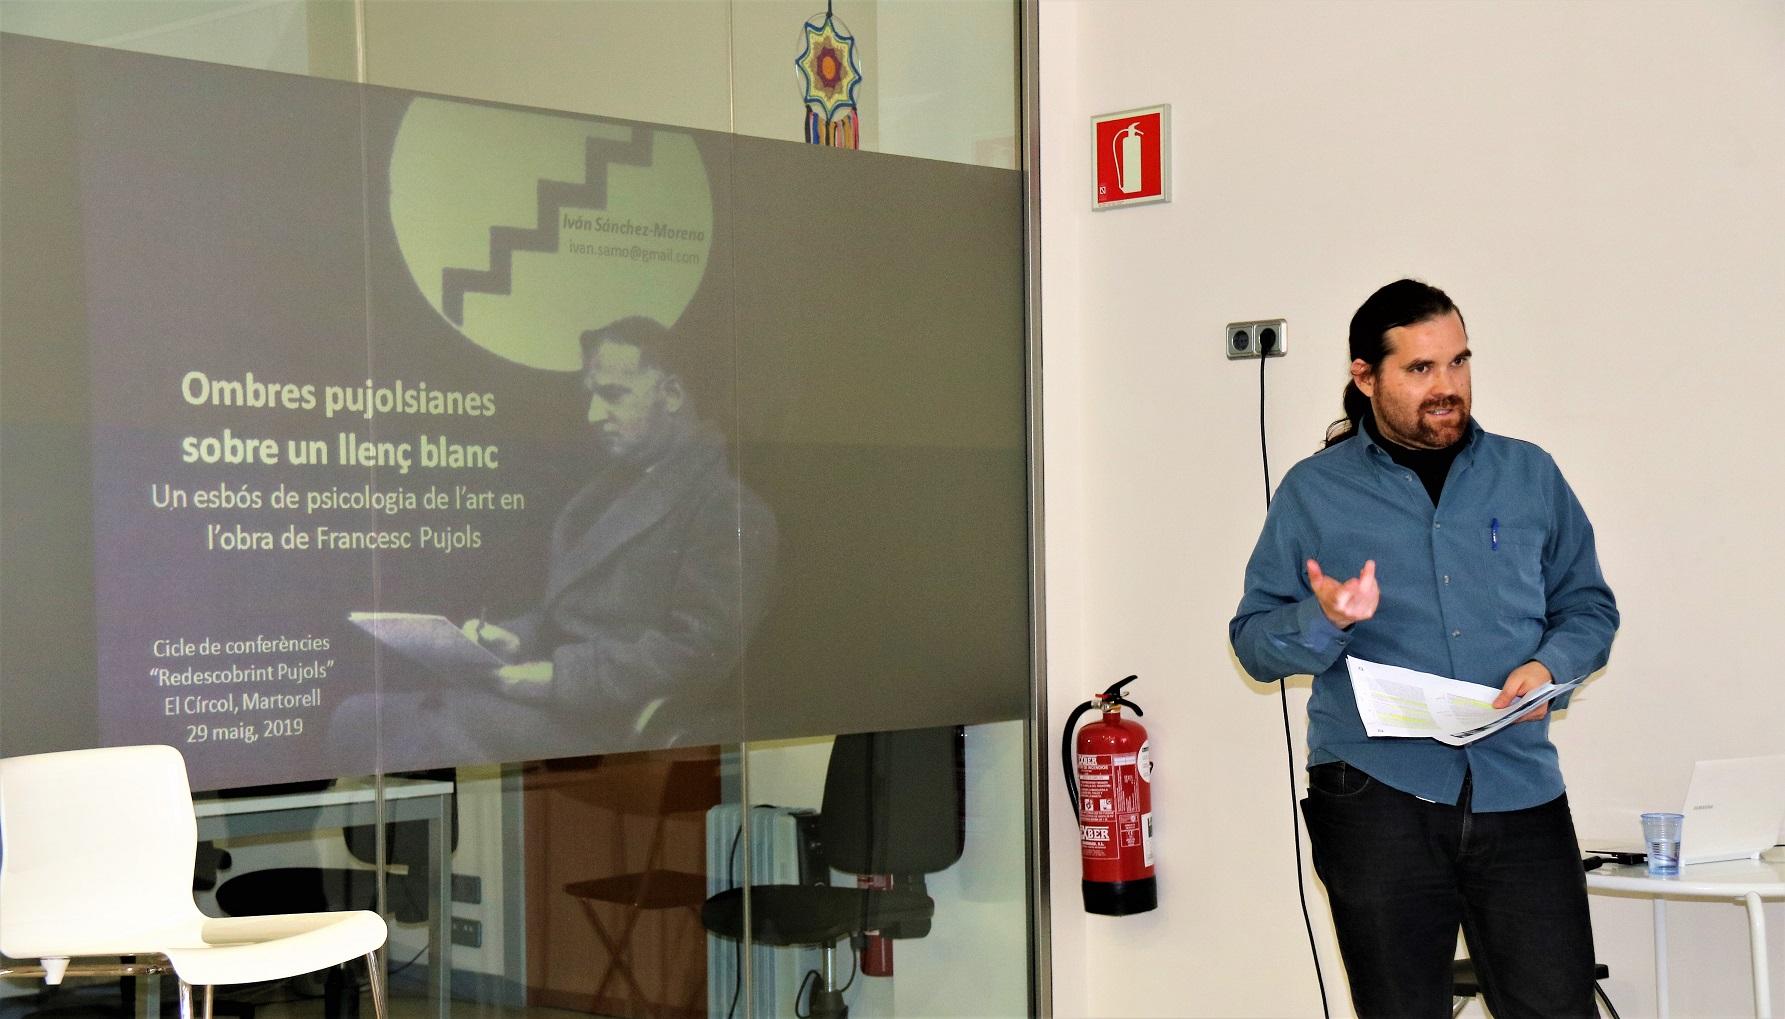 'Redescobrint Pujols'. Conferència Iván Sánchez